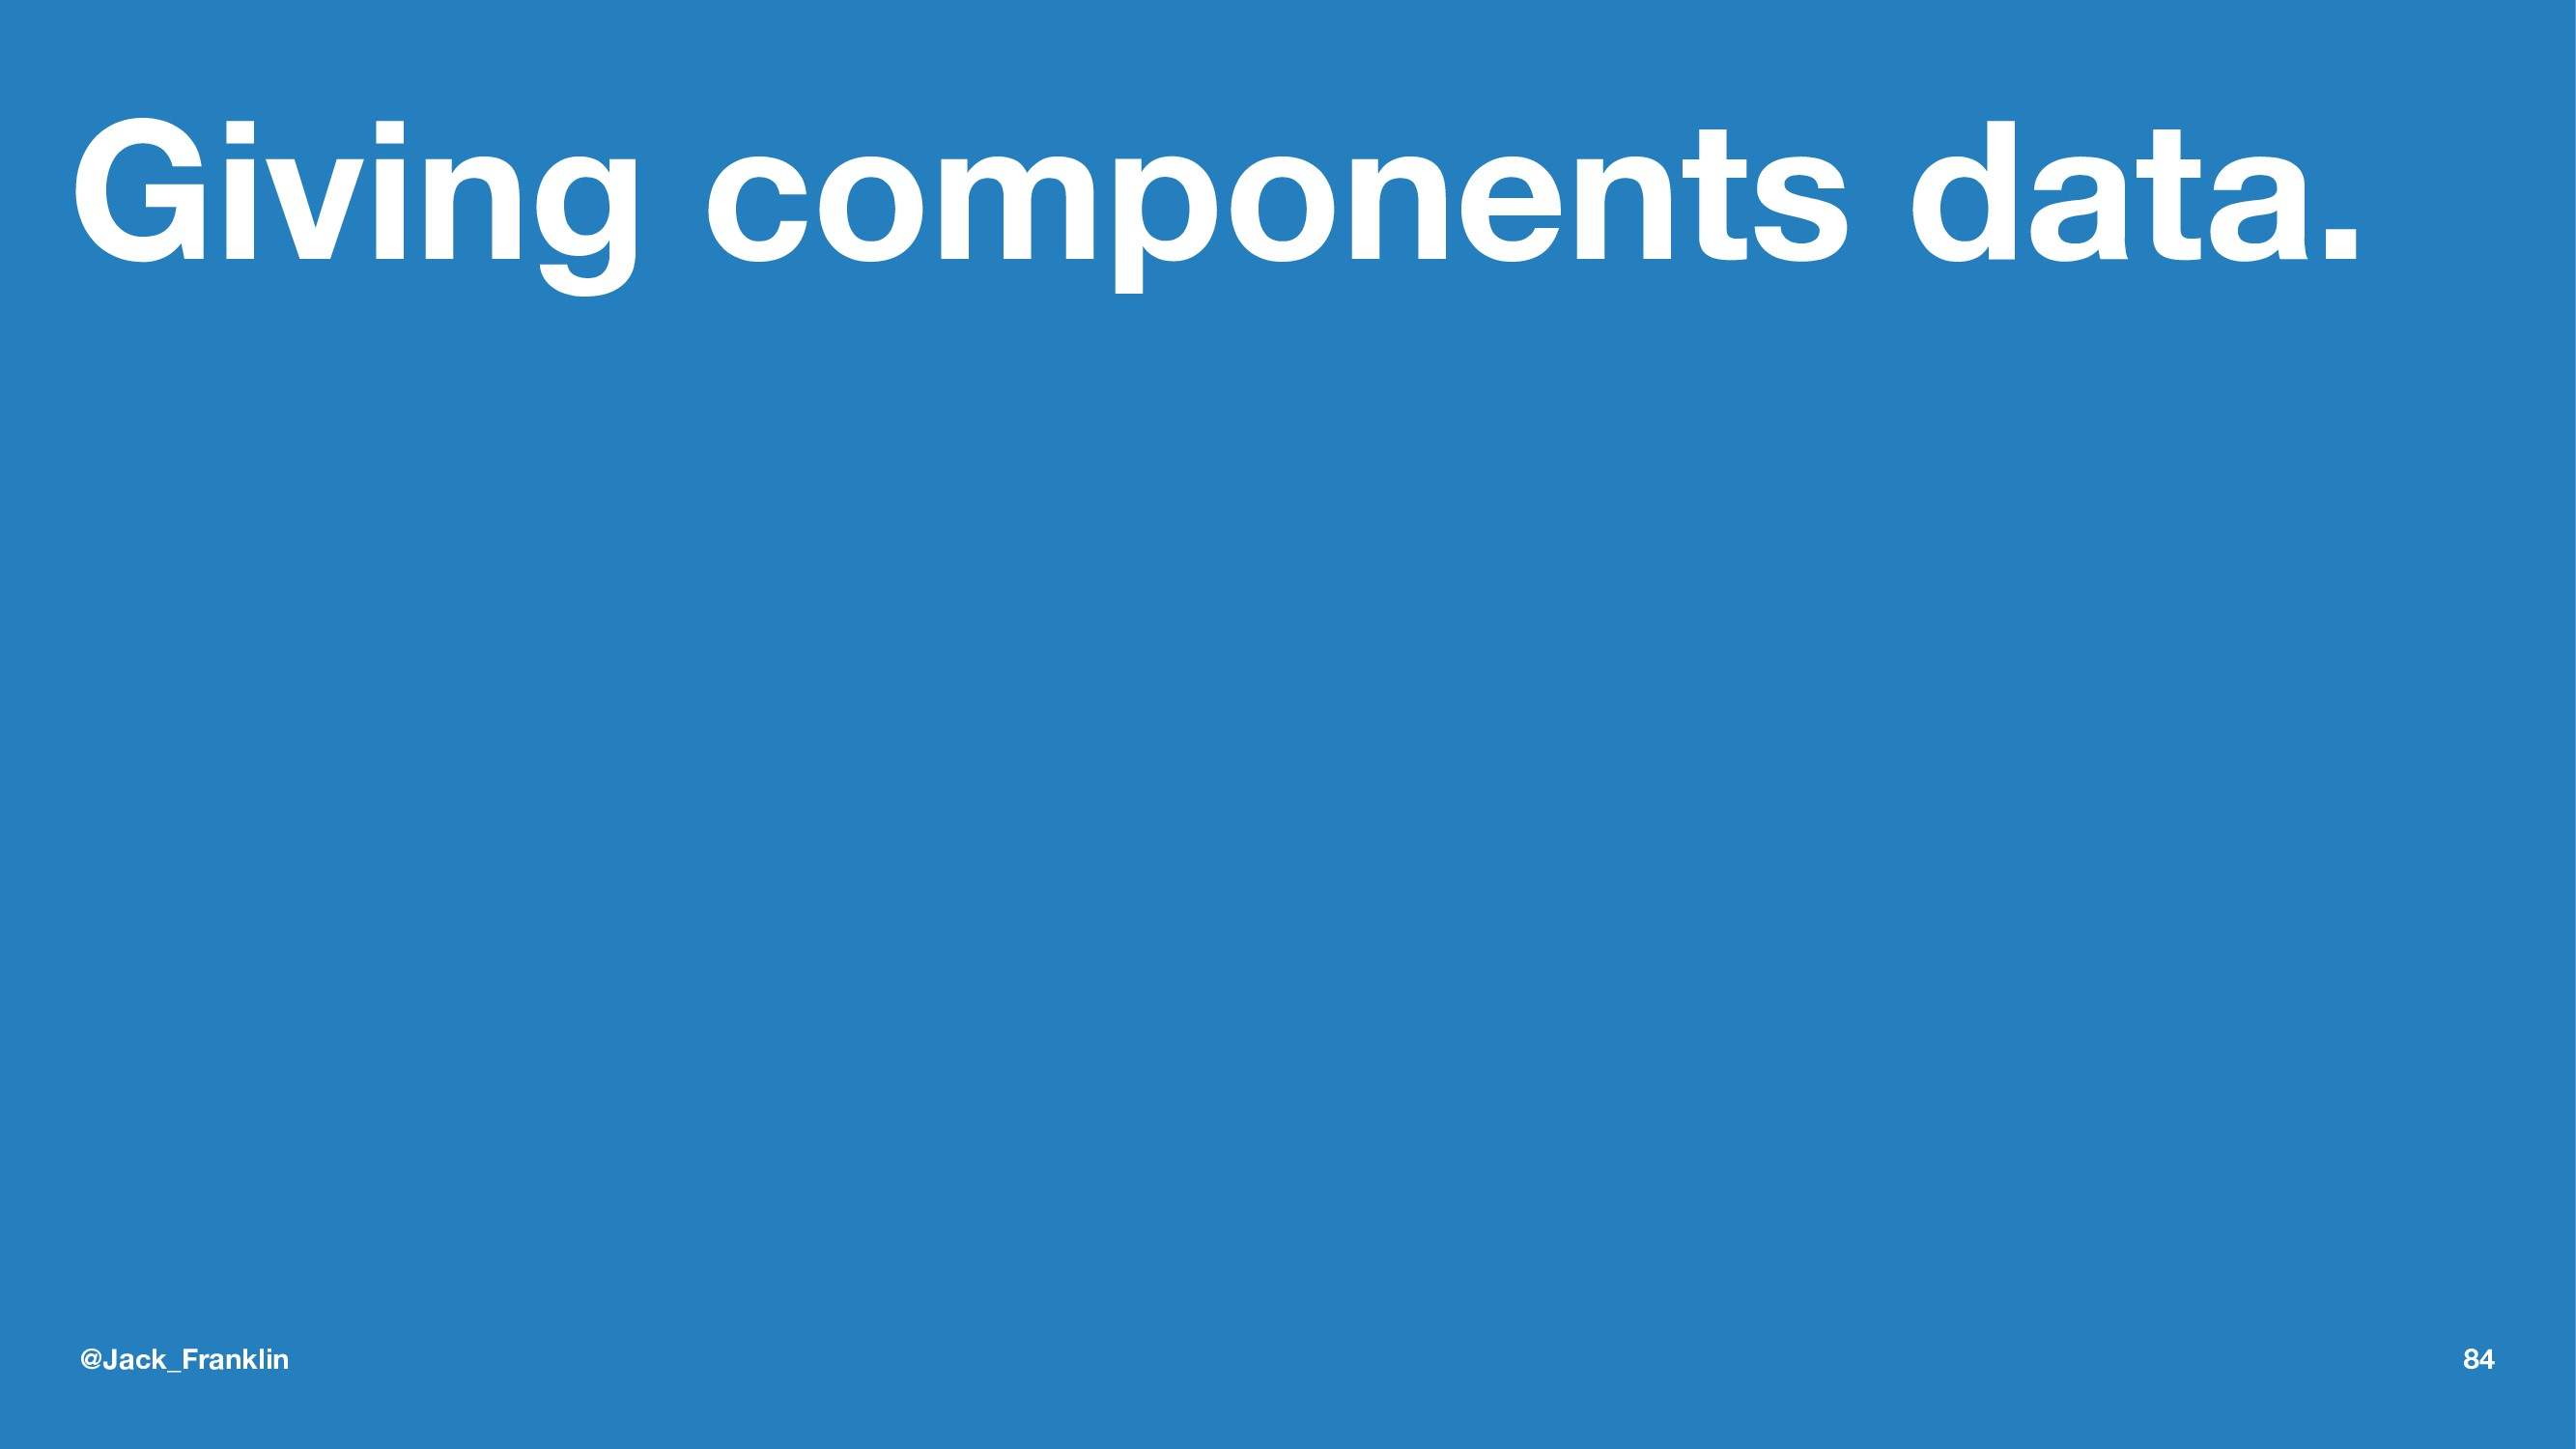 Giving components data. @Jack_Franklin 84